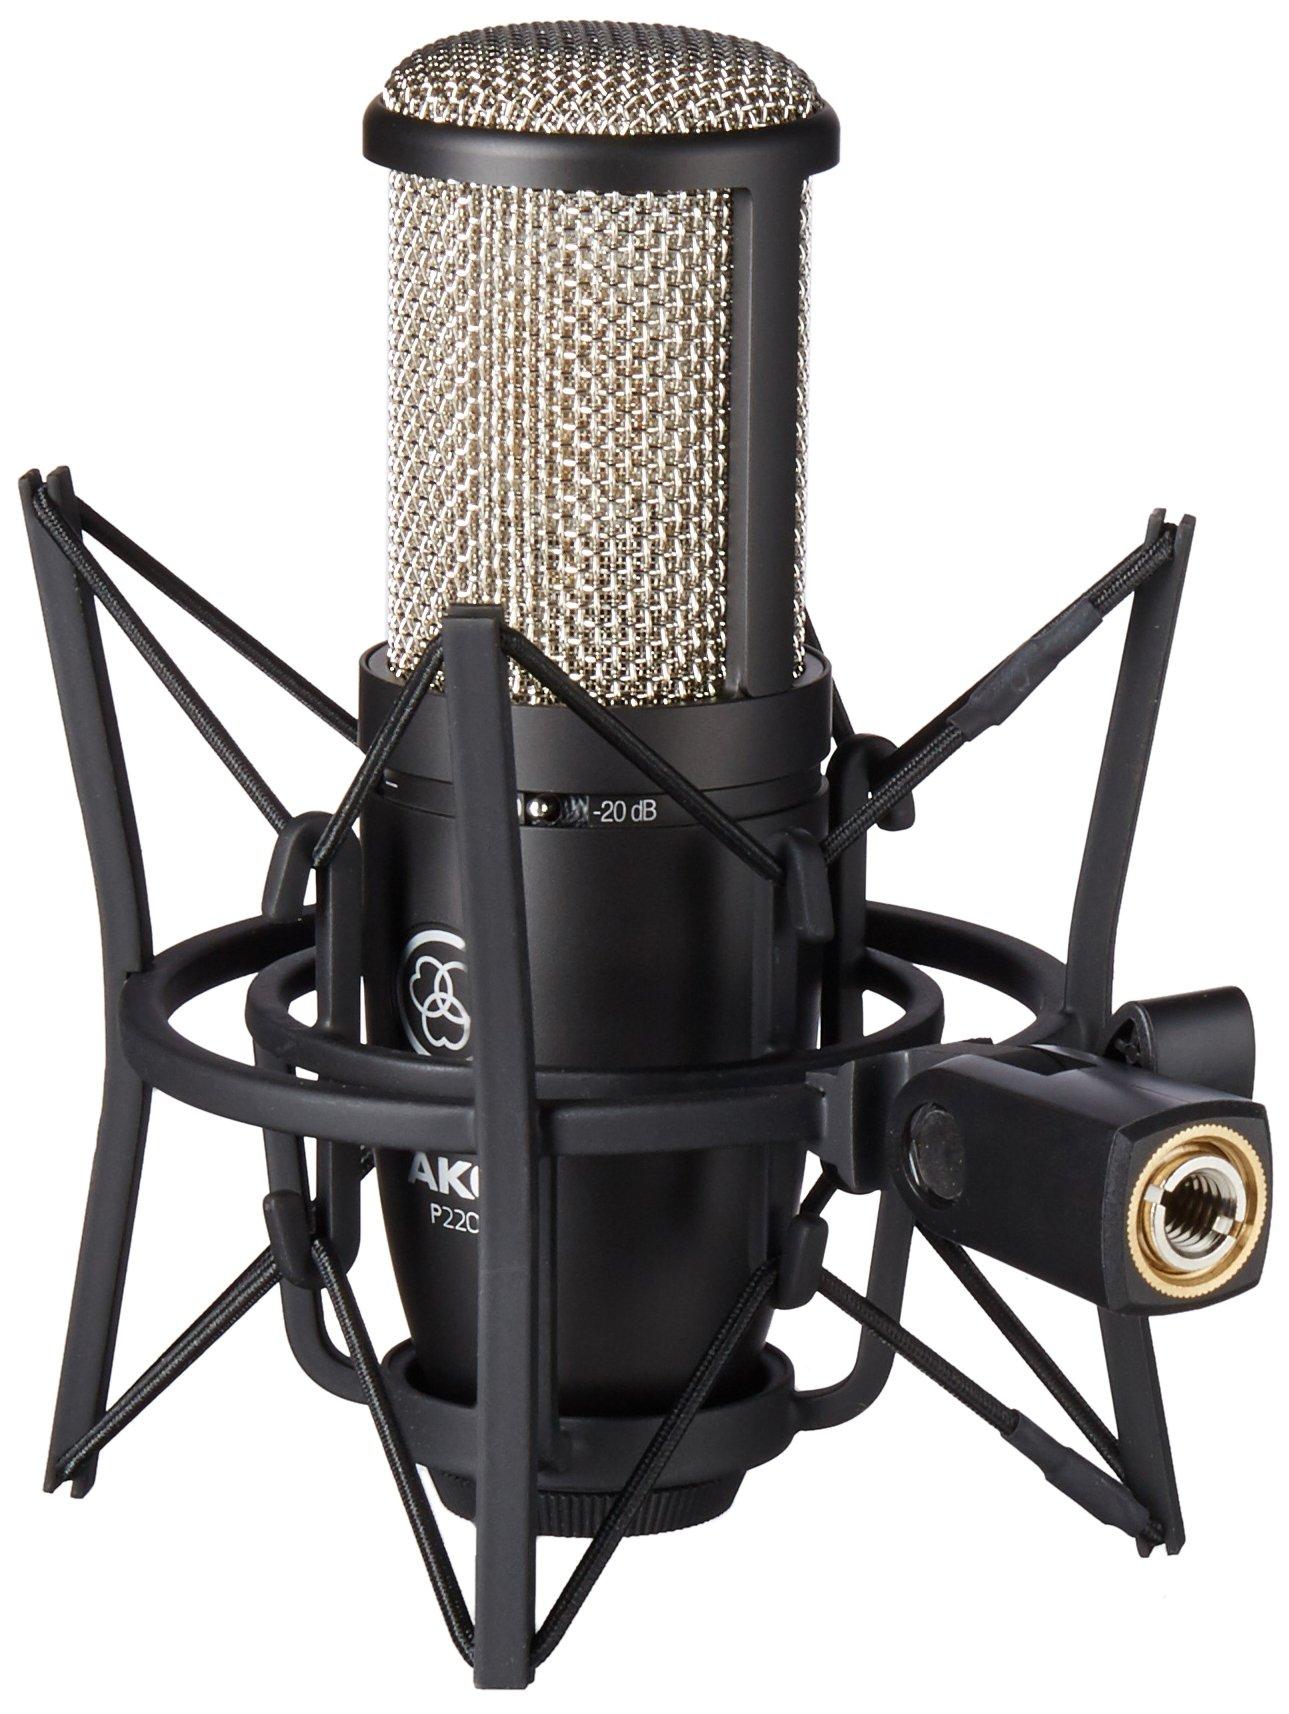 AKG Perception 220 Professional Studio Microphone by AKG Pro Audio (Image #2)